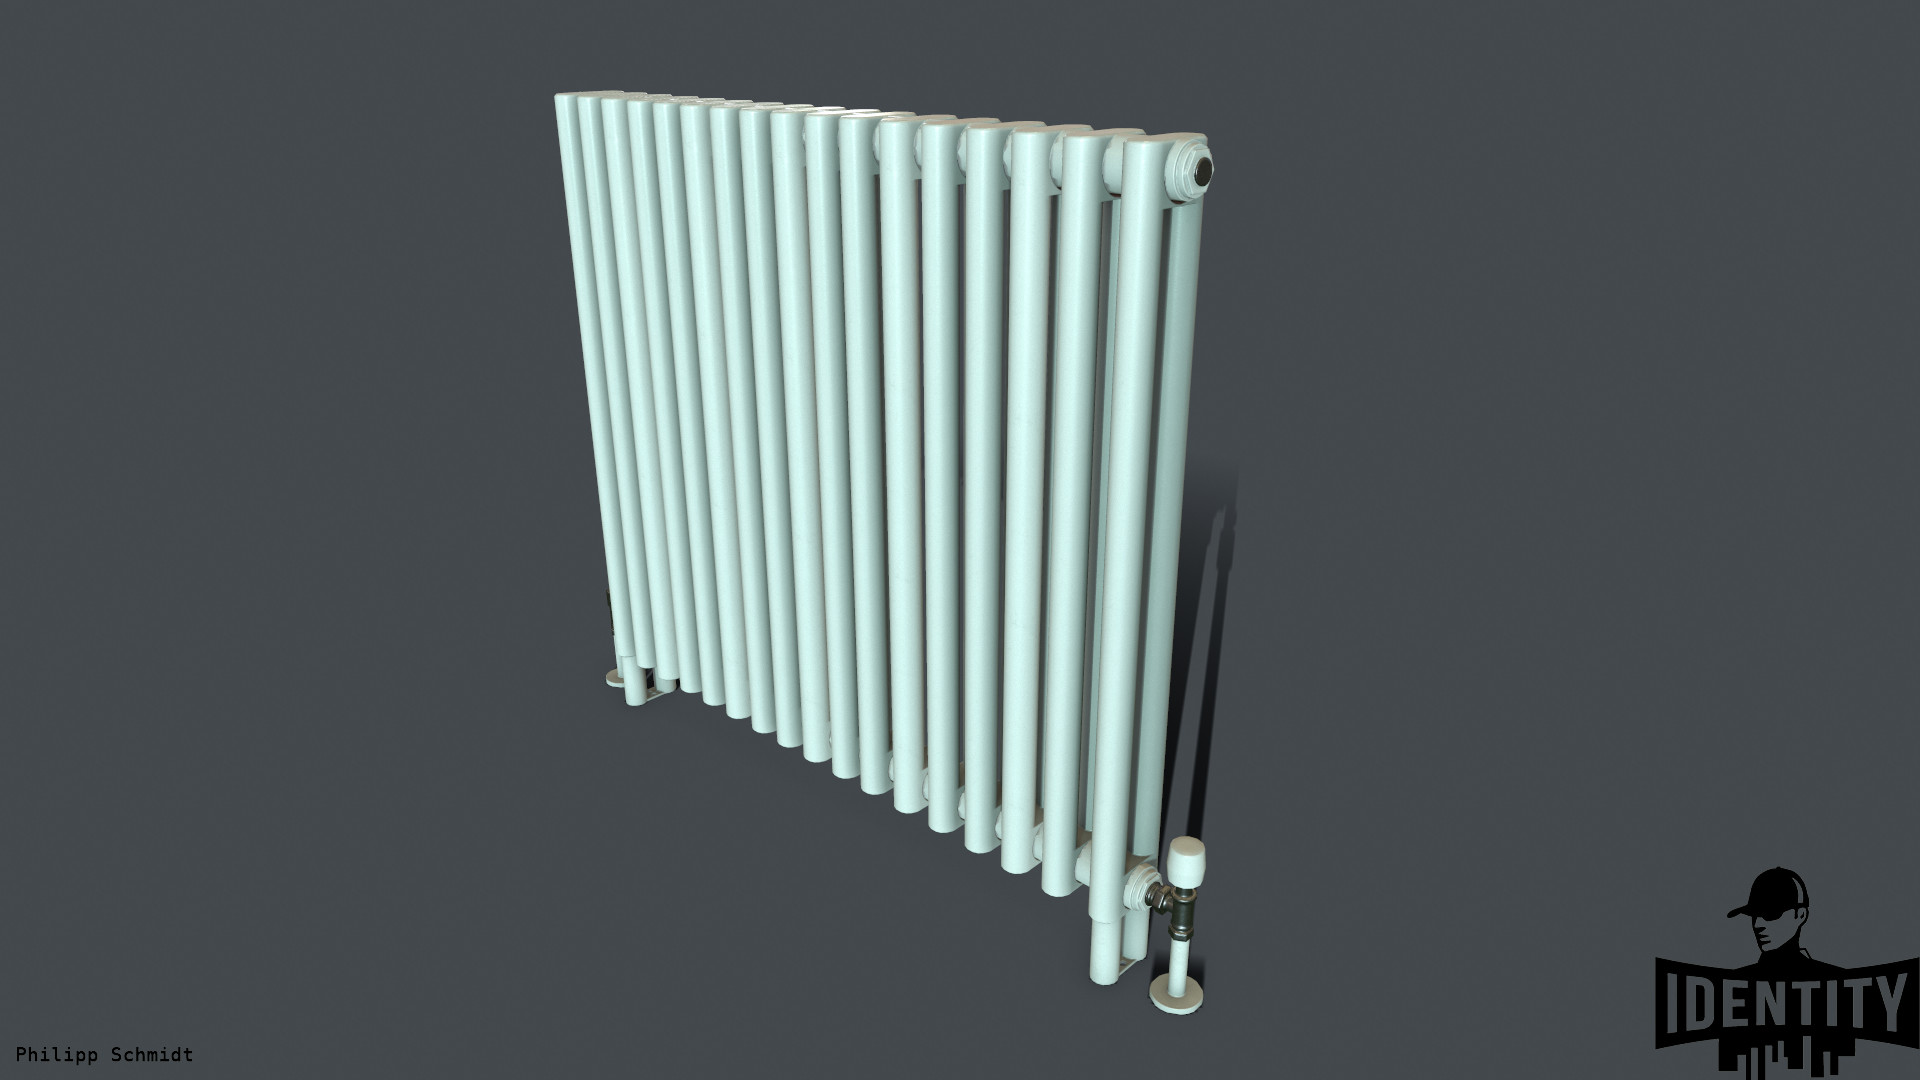 Philipp schmidt radiator